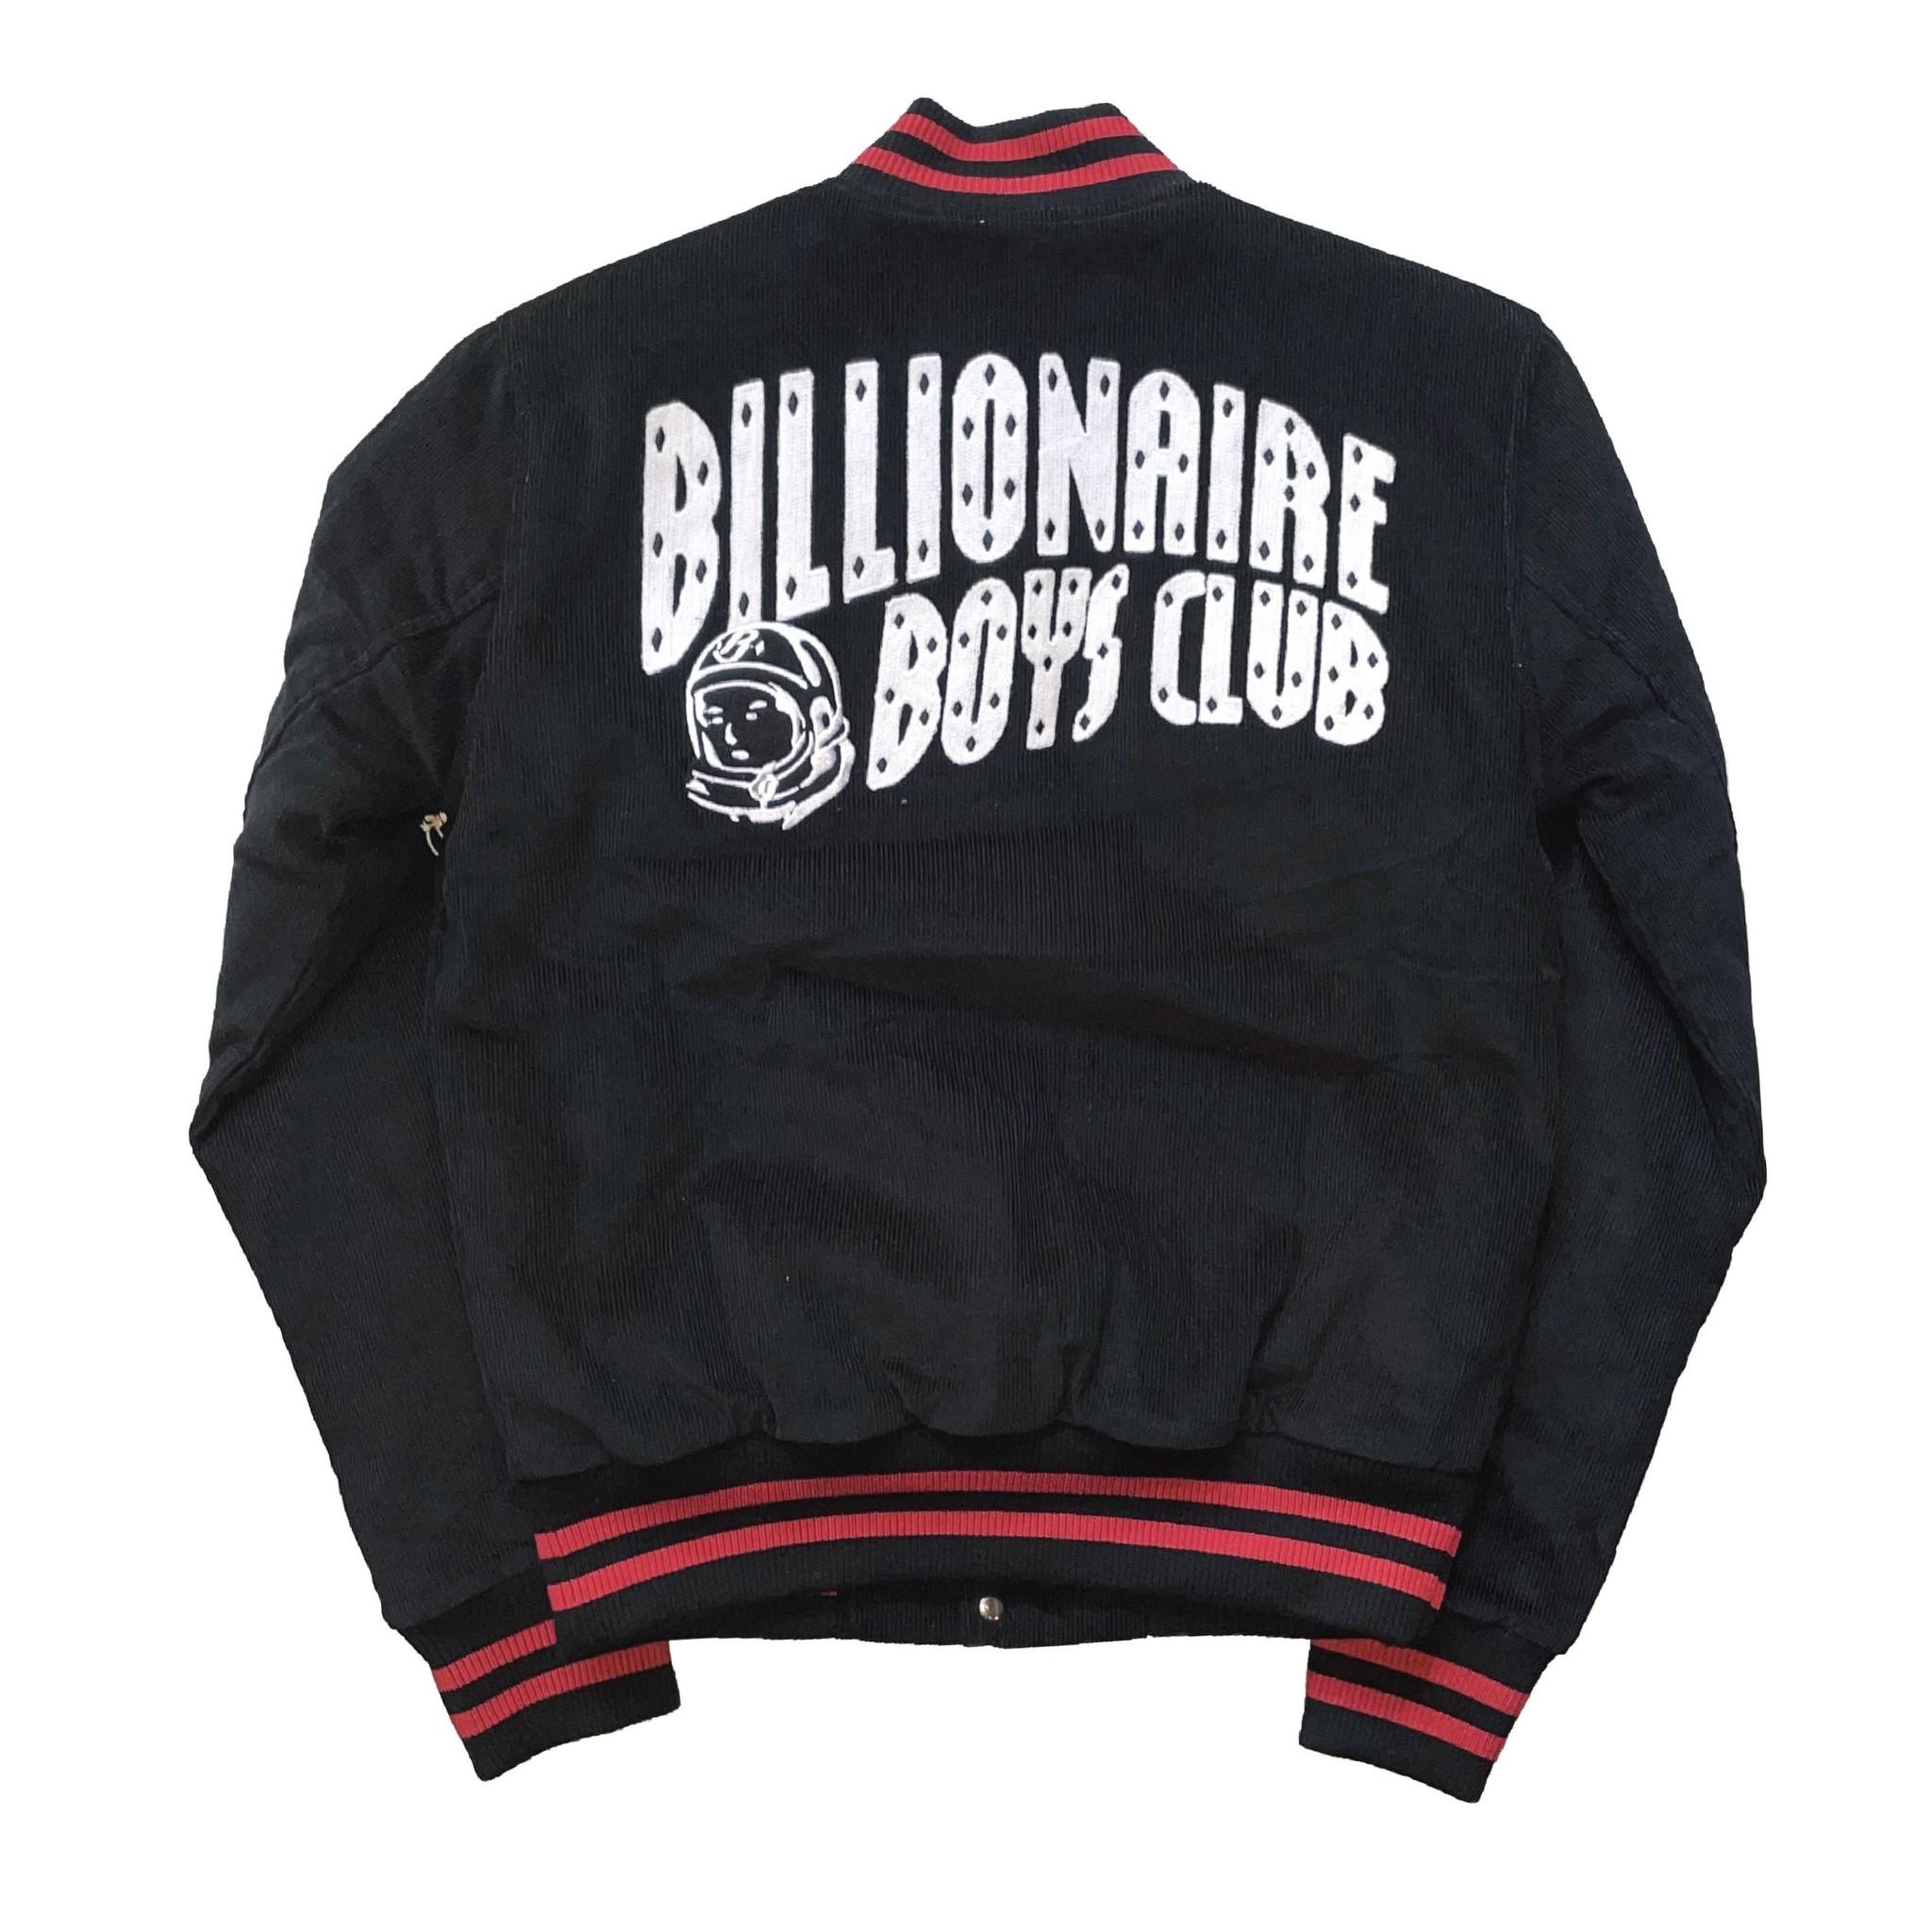 BBC BBC BB Monies Jacket Black